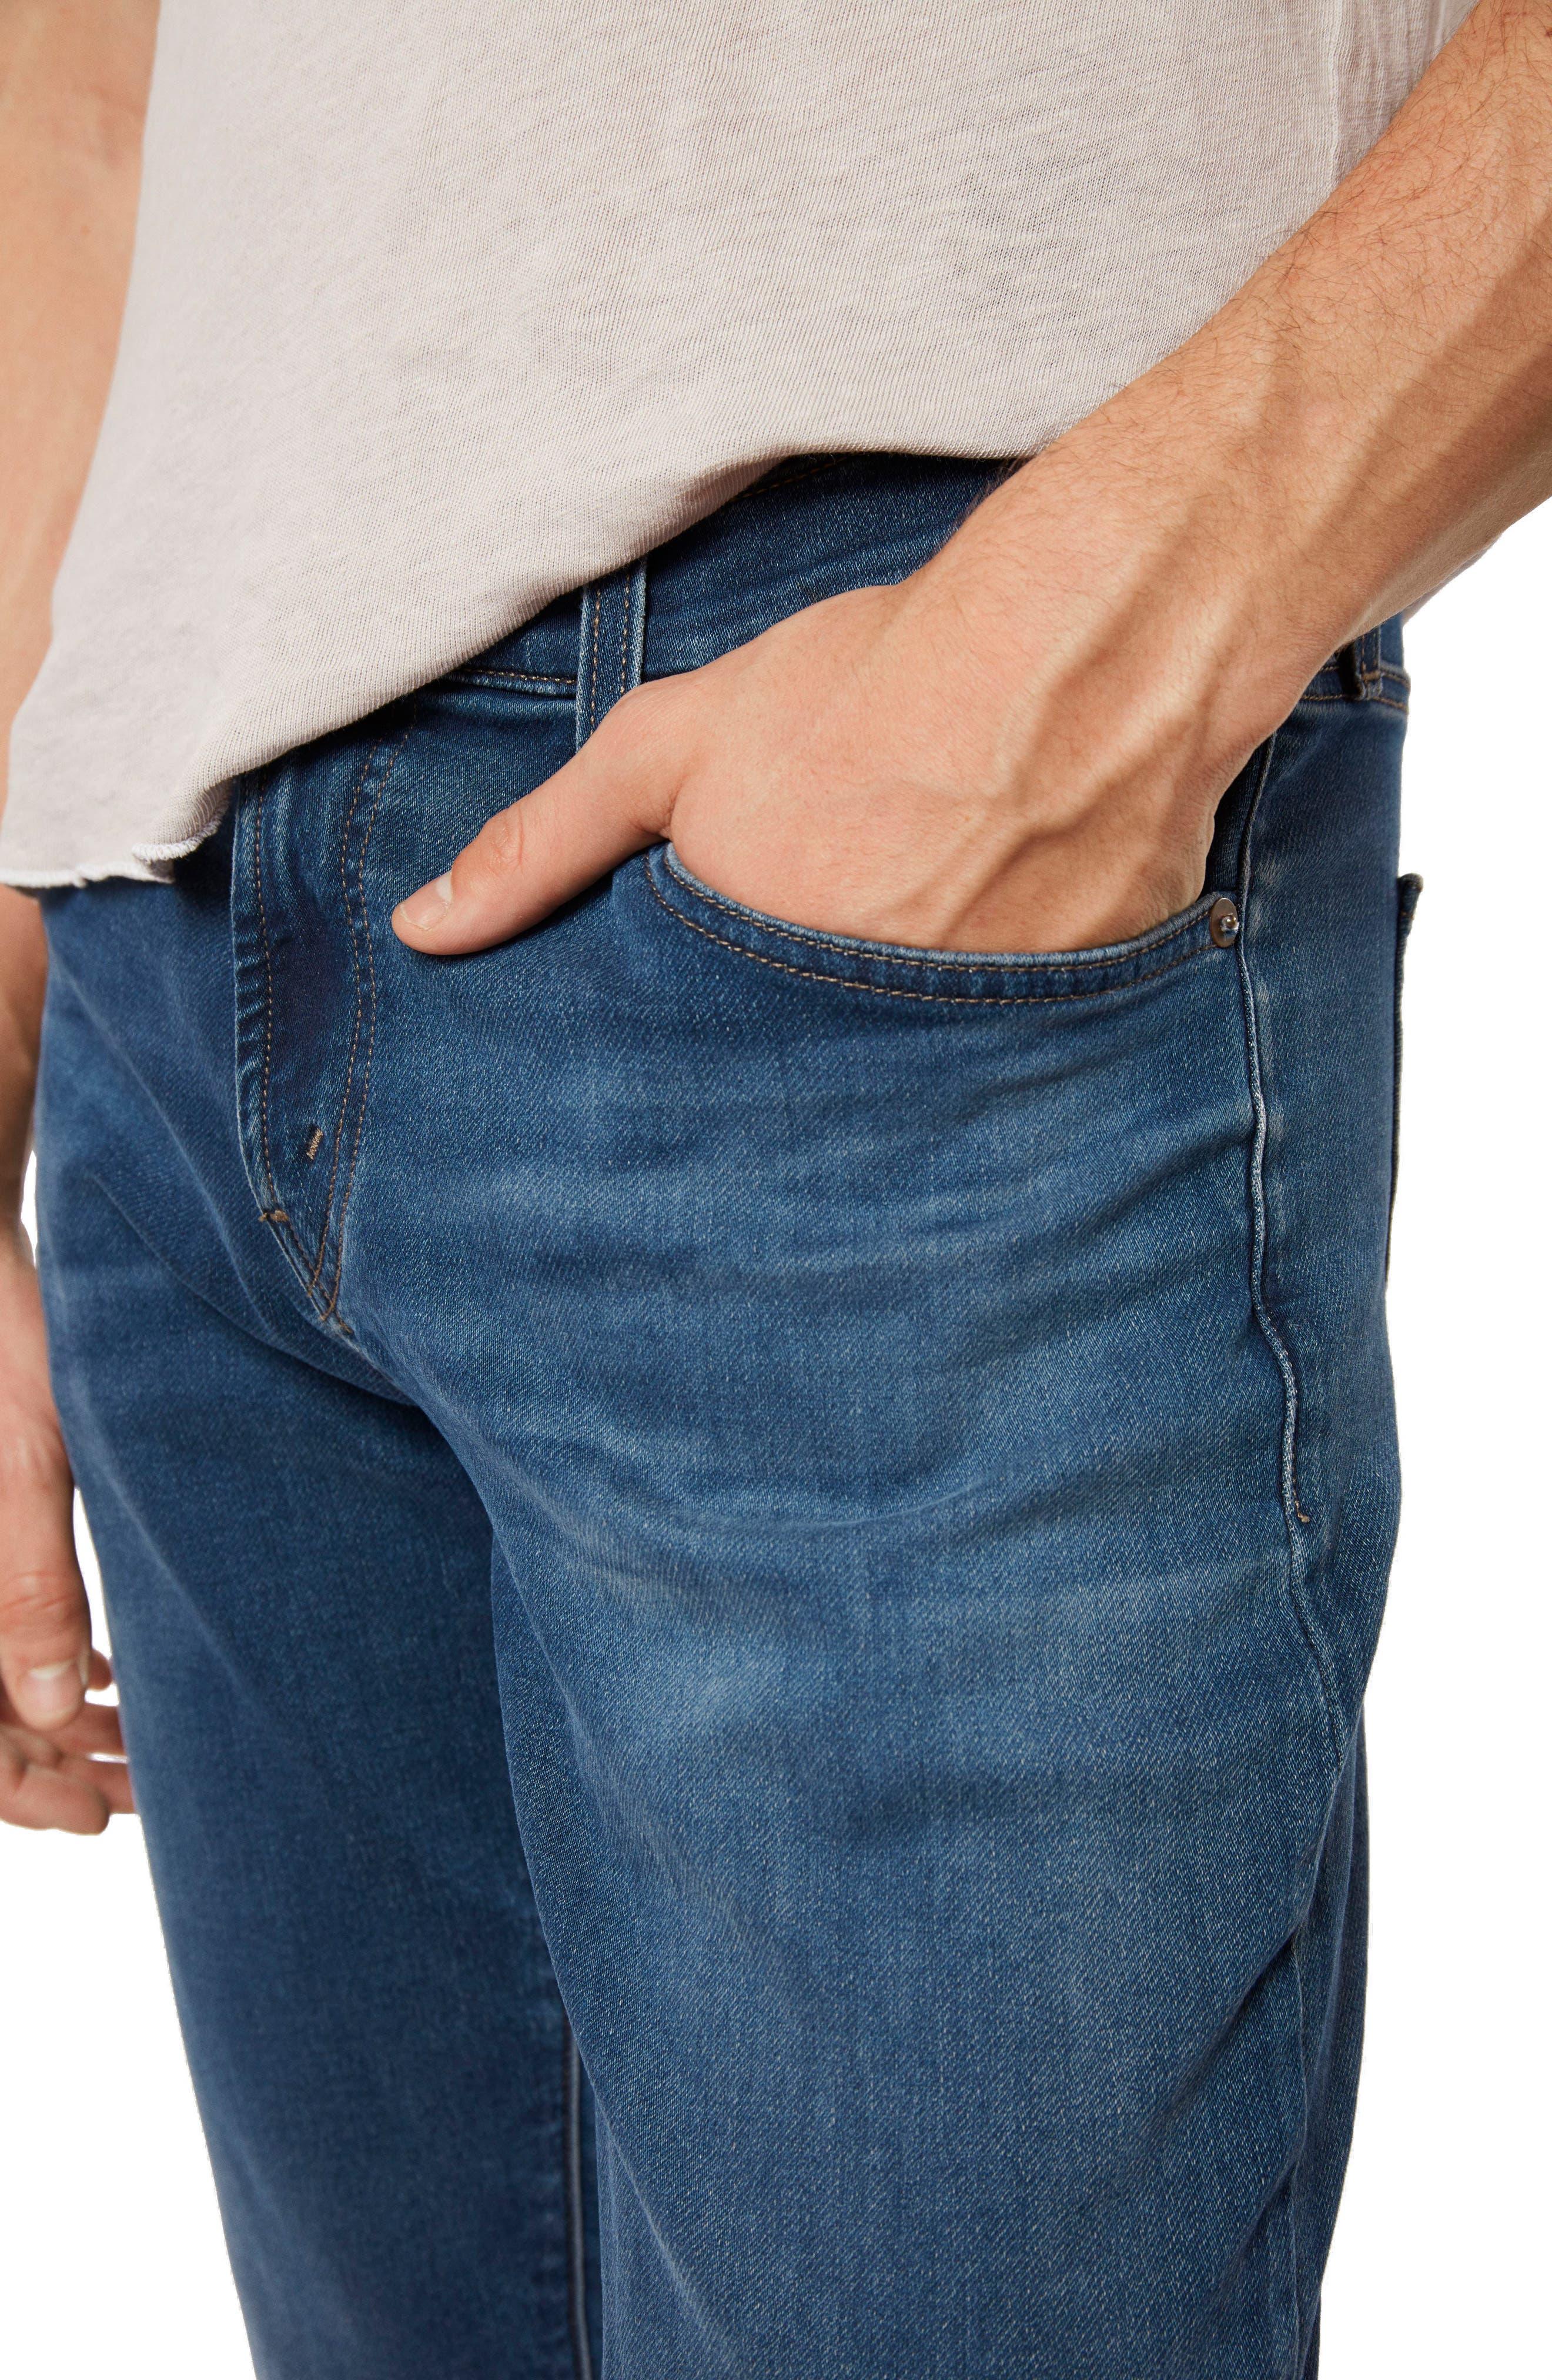 Kane Slim Straight Leg Jeans,                             Alternate thumbnail 5, color,                             Landform